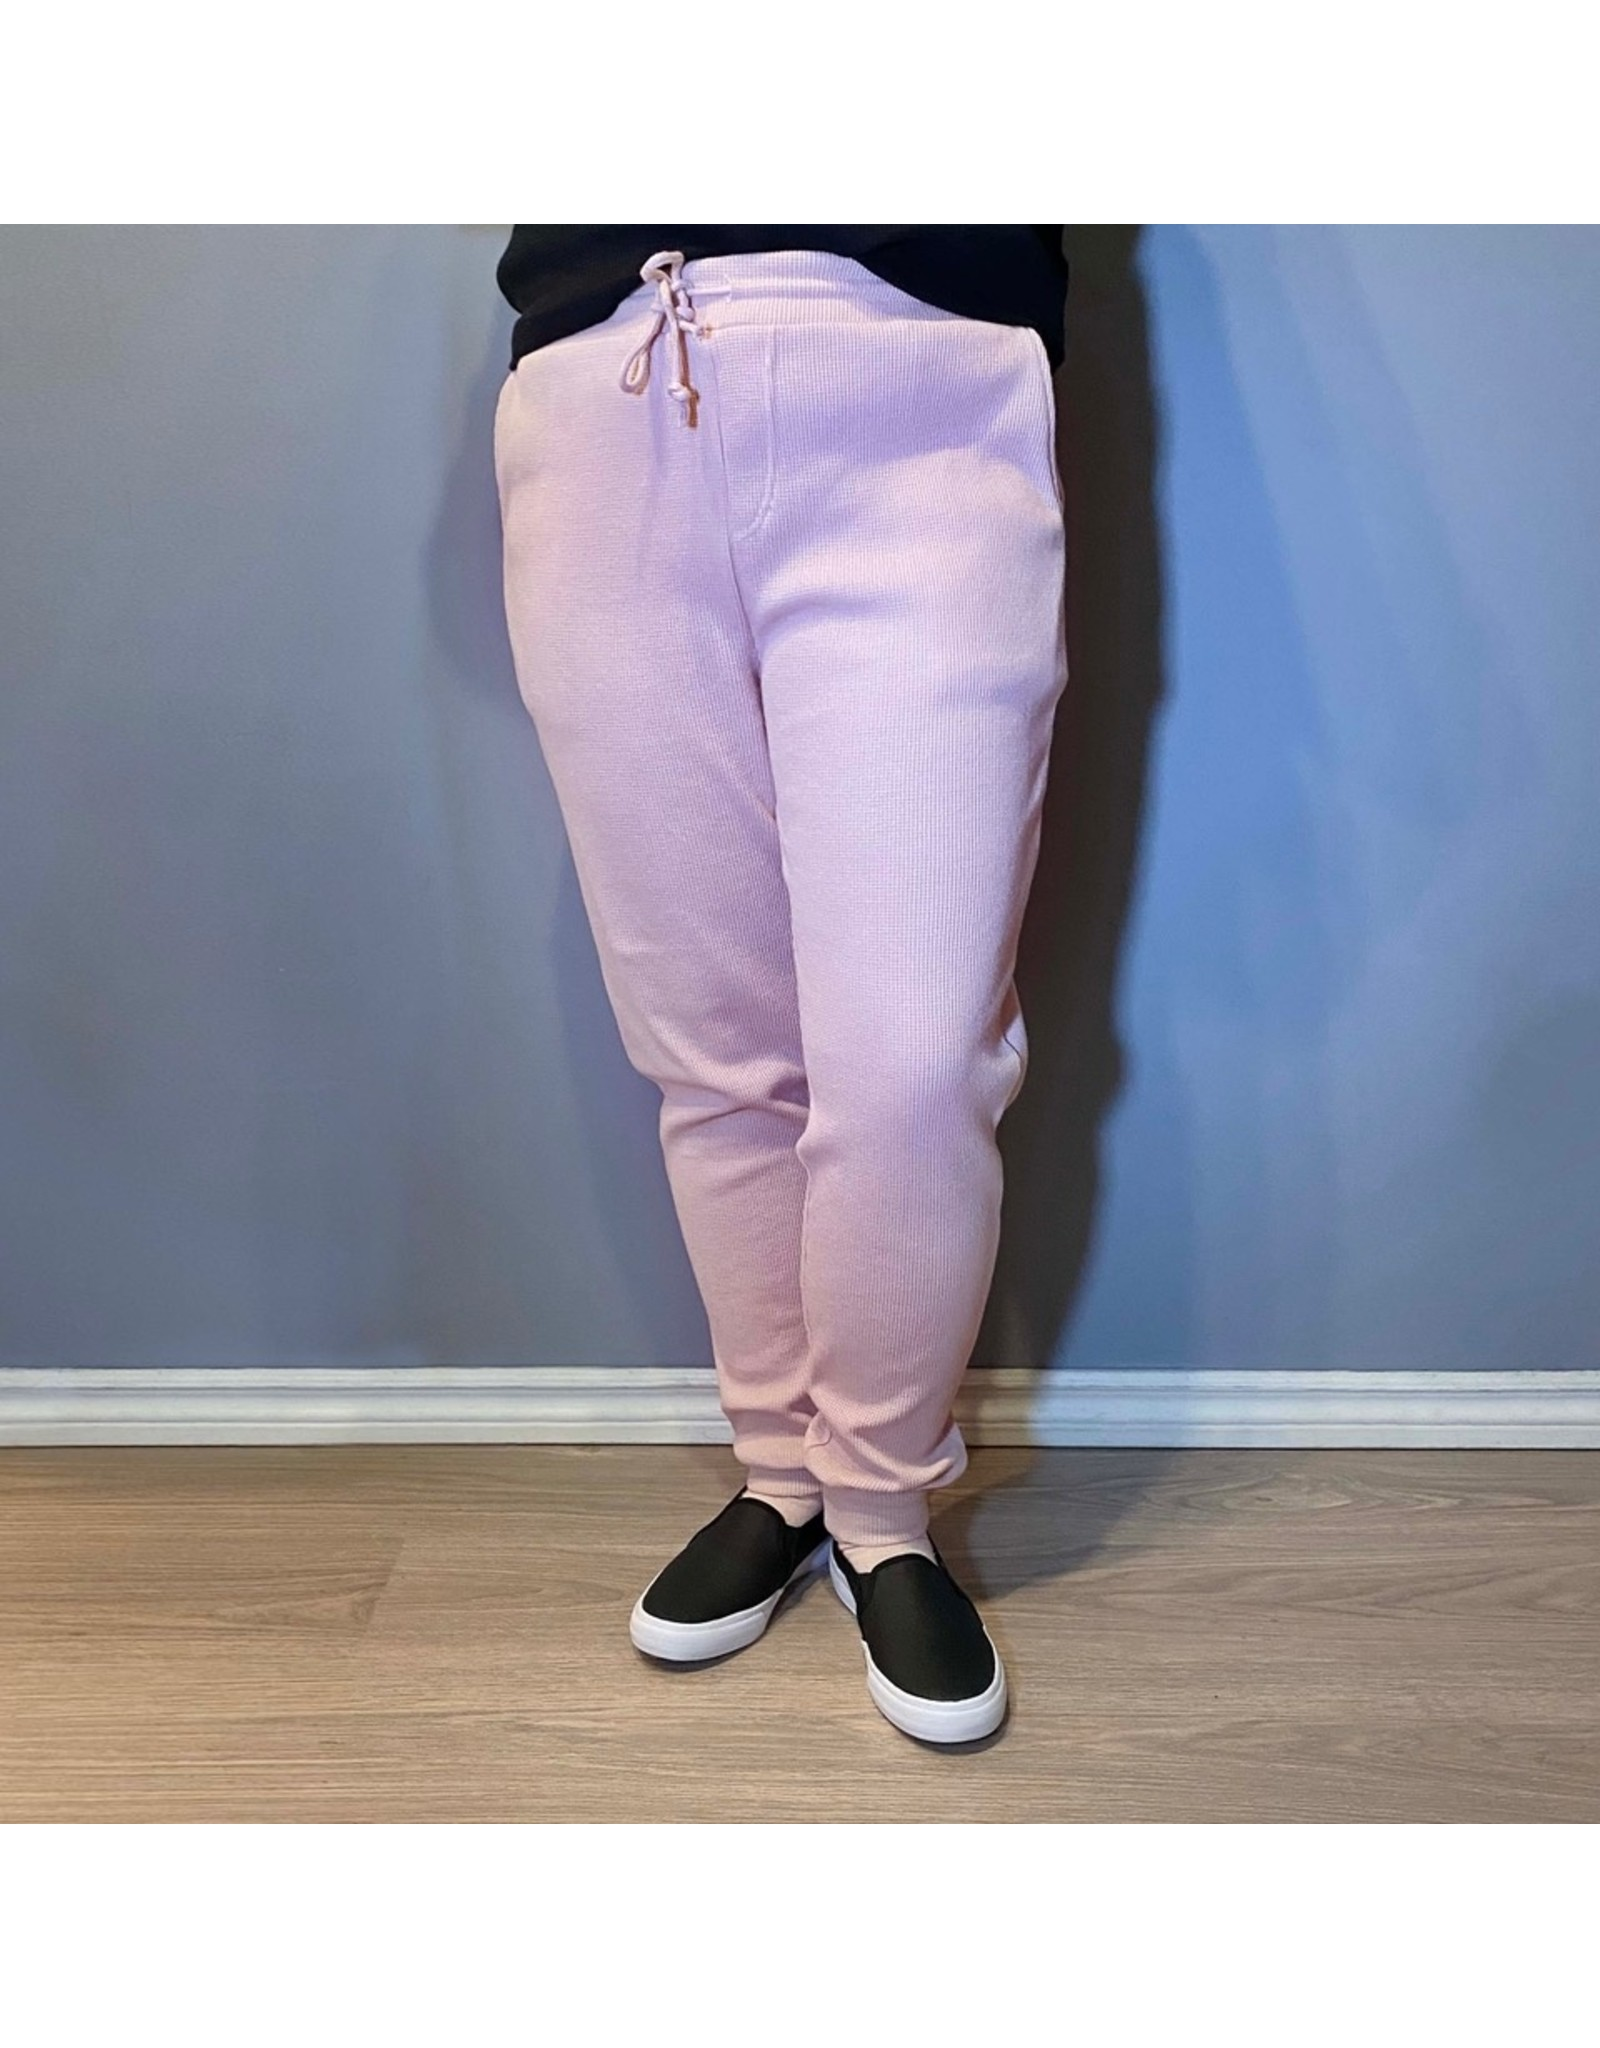 Bonanza - Snuggle Waffle Pant in Blue, Black or Pink